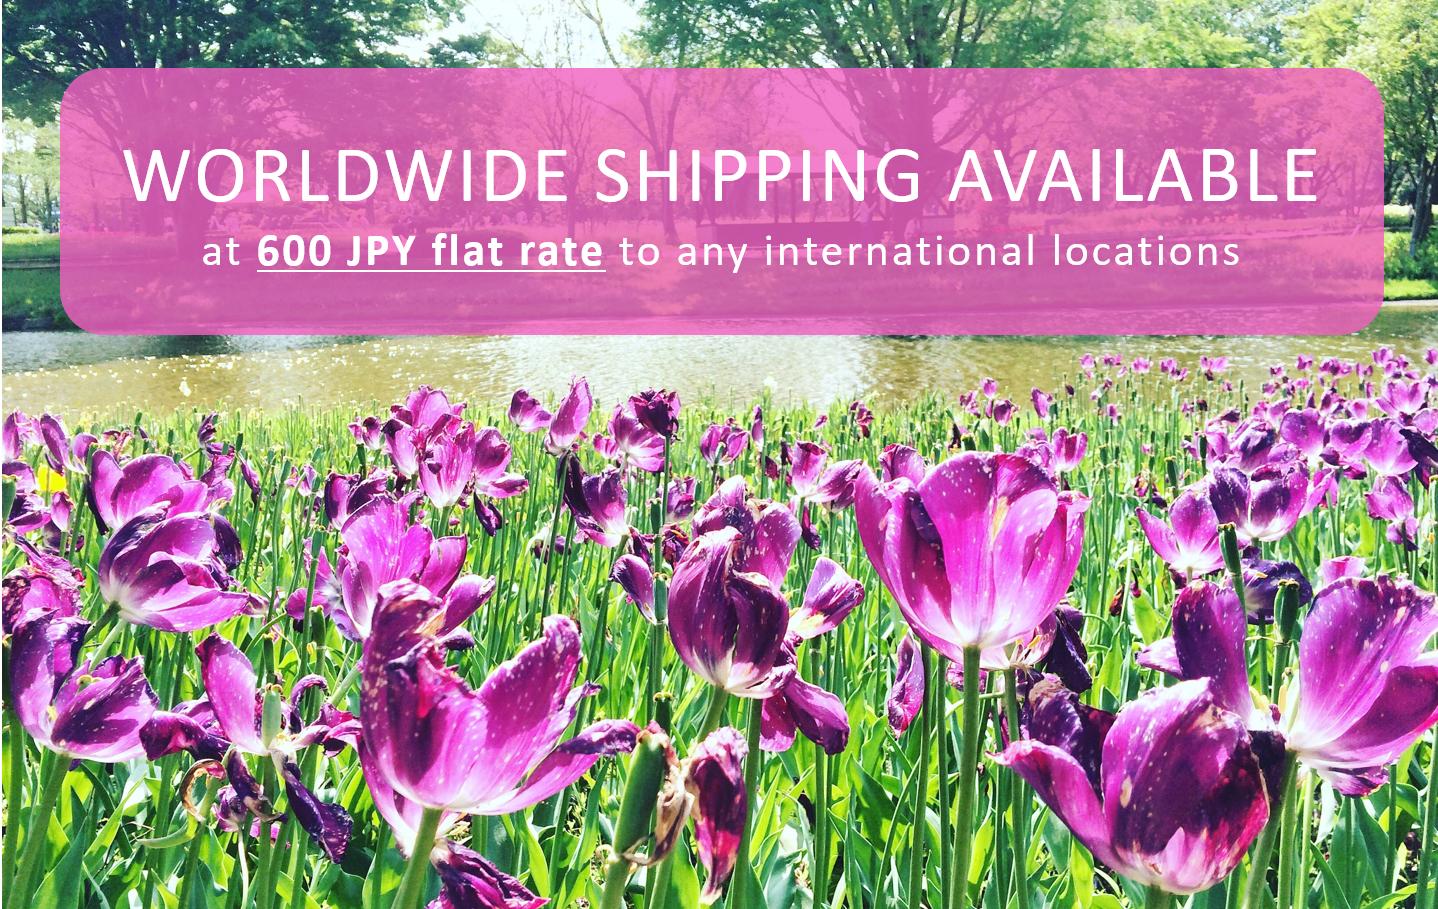 Shipment info